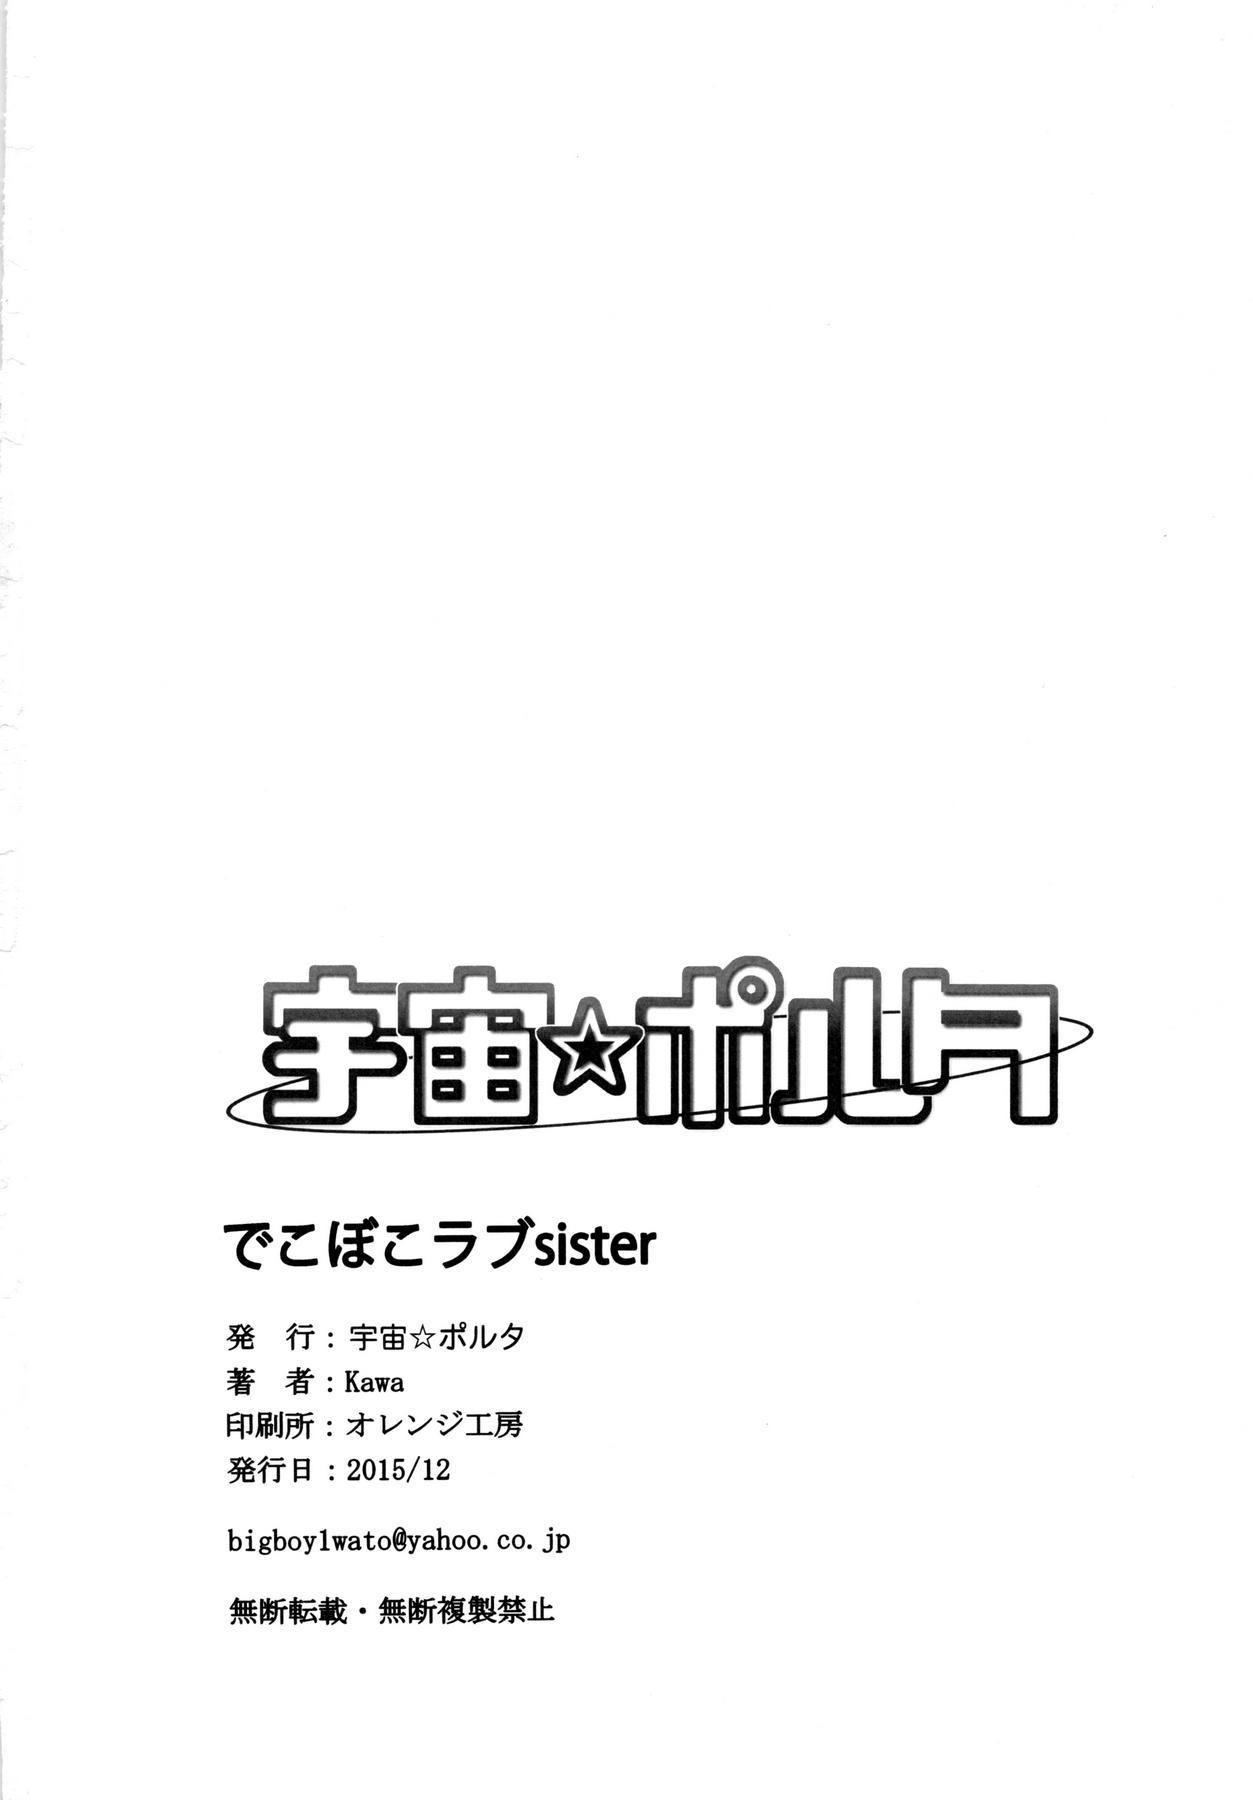 Dekoboko Love Sister 20